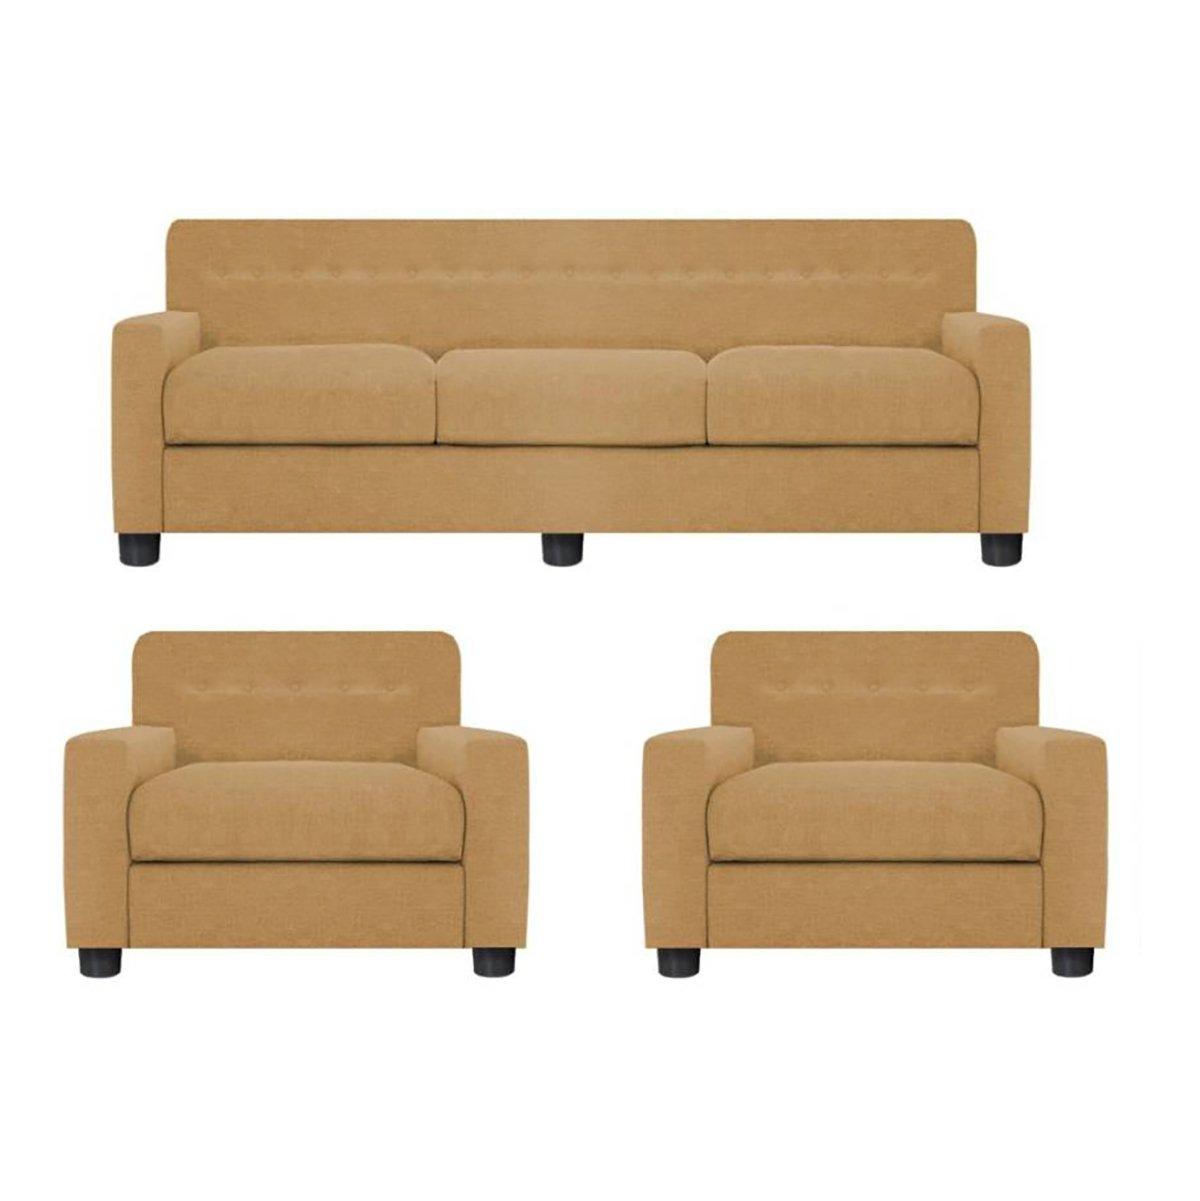 Furnituremaxx Dahra Contemporary Jute Color Fabric Sofa Set